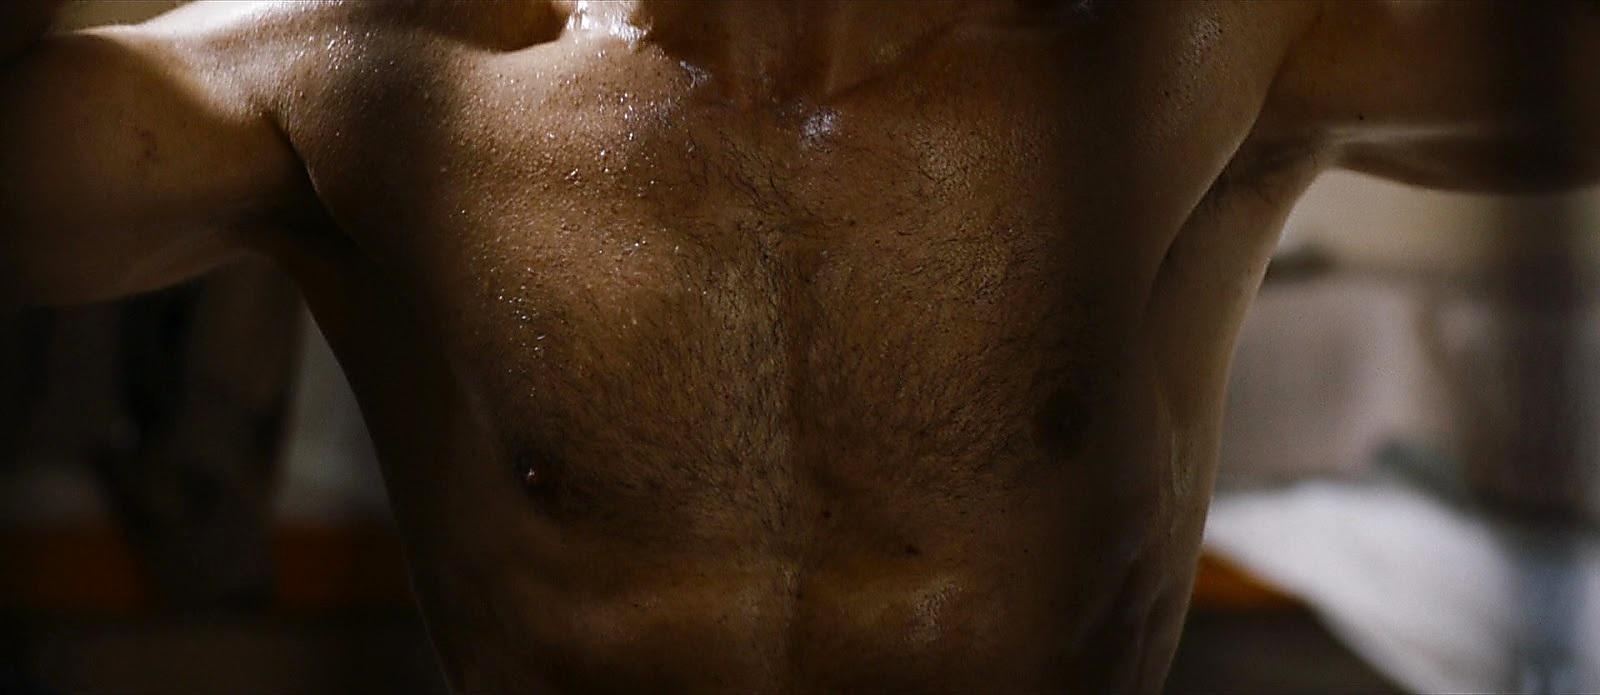 Luca Argentero sexy shirtless scene July 28, 2017, 9am